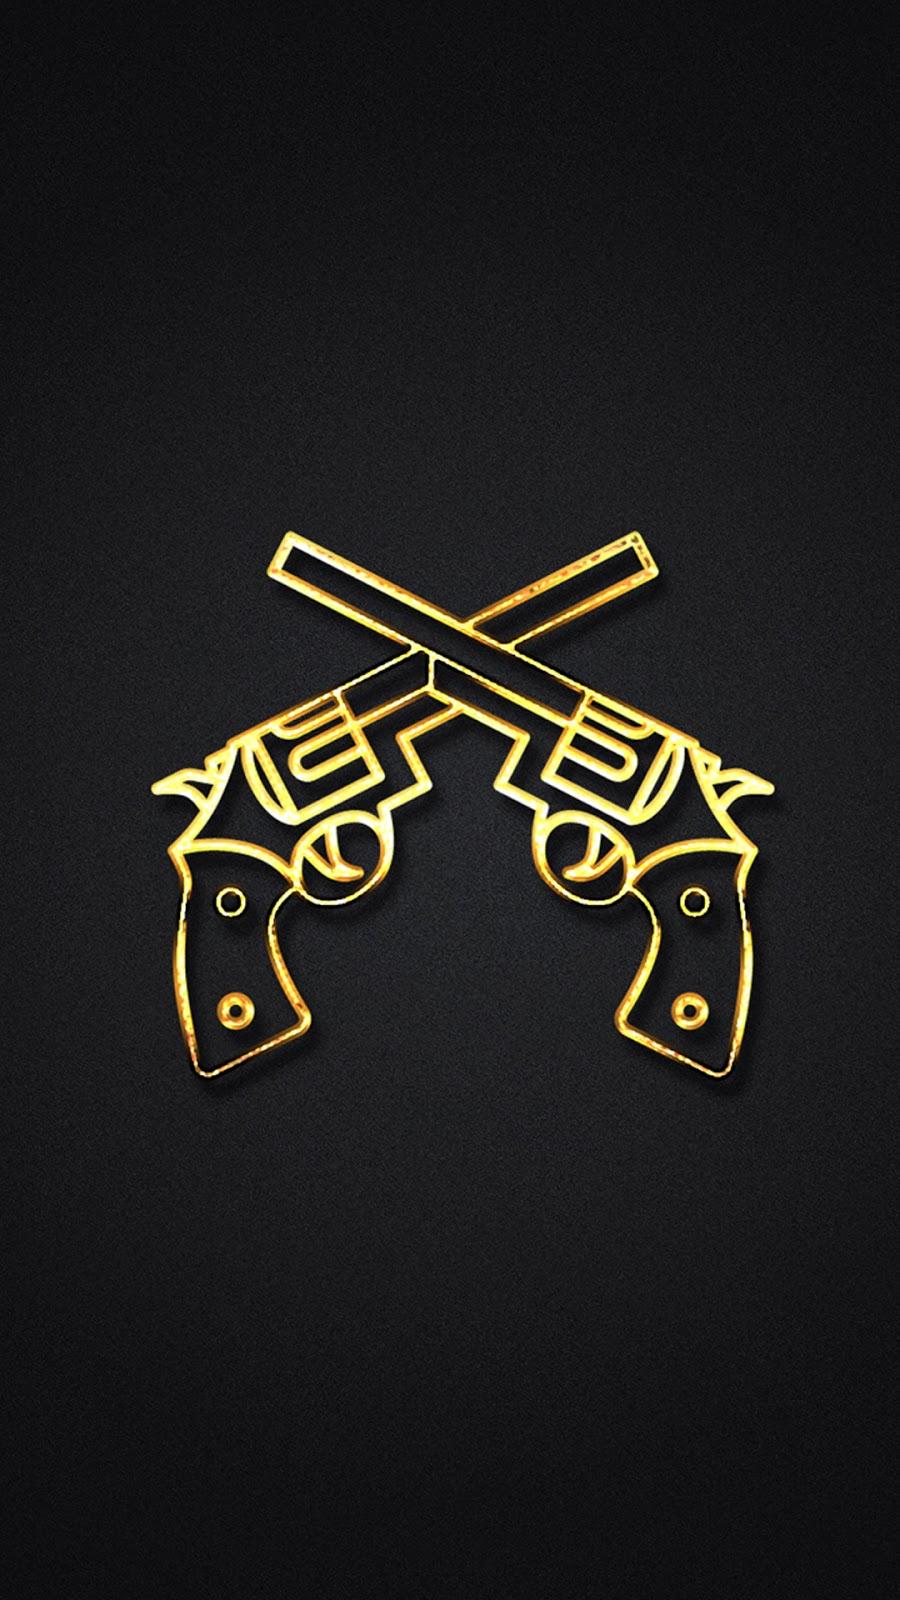 Gold Gun IPhone 7 And Plus HD Wallpaper